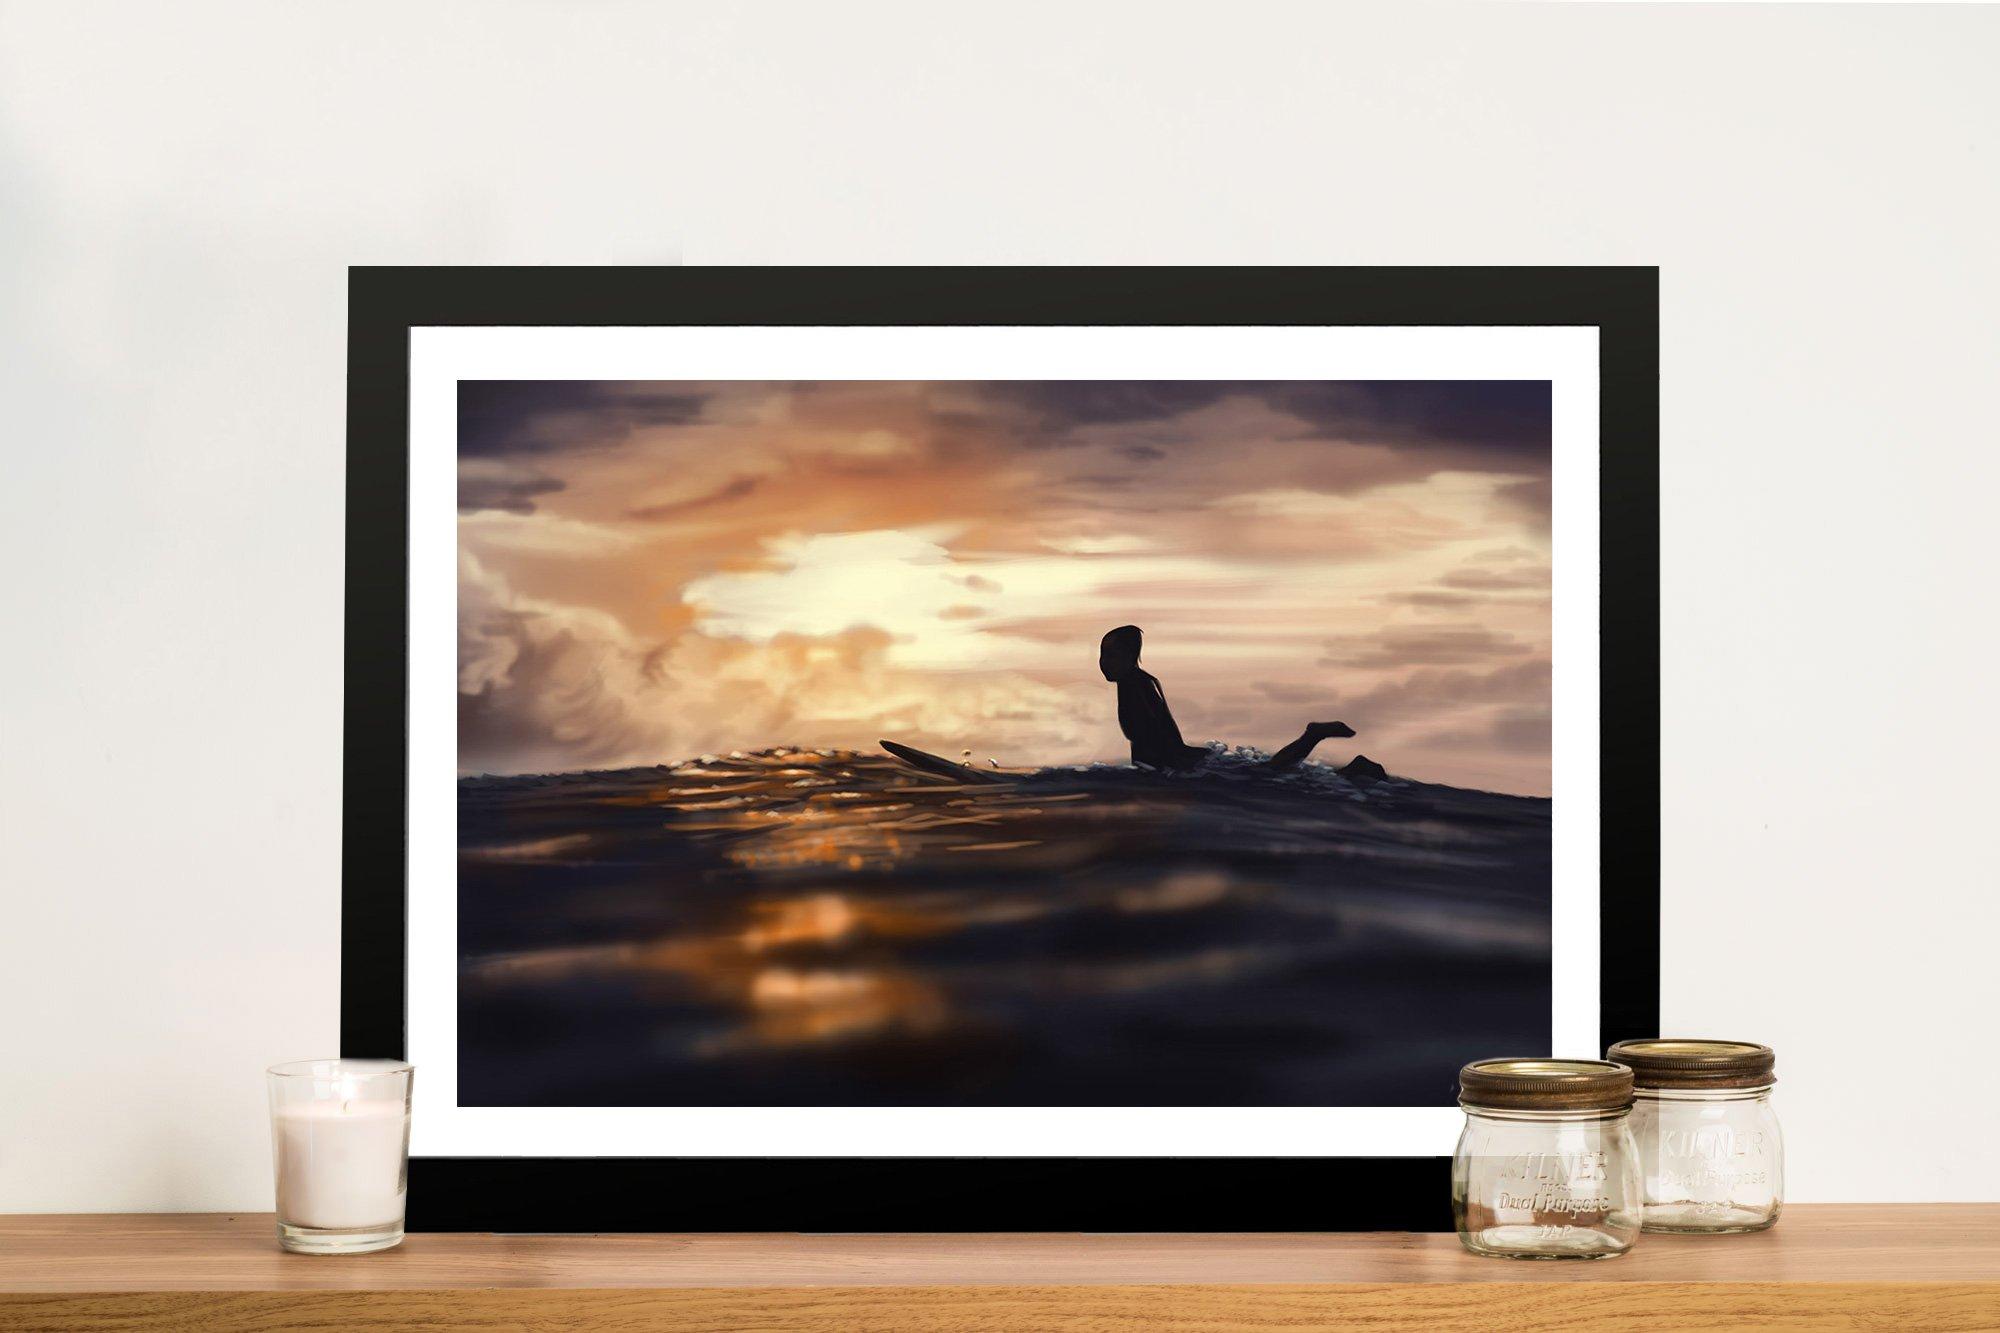 Sunset Surfing Framed Print Gift Ideas for Surfers